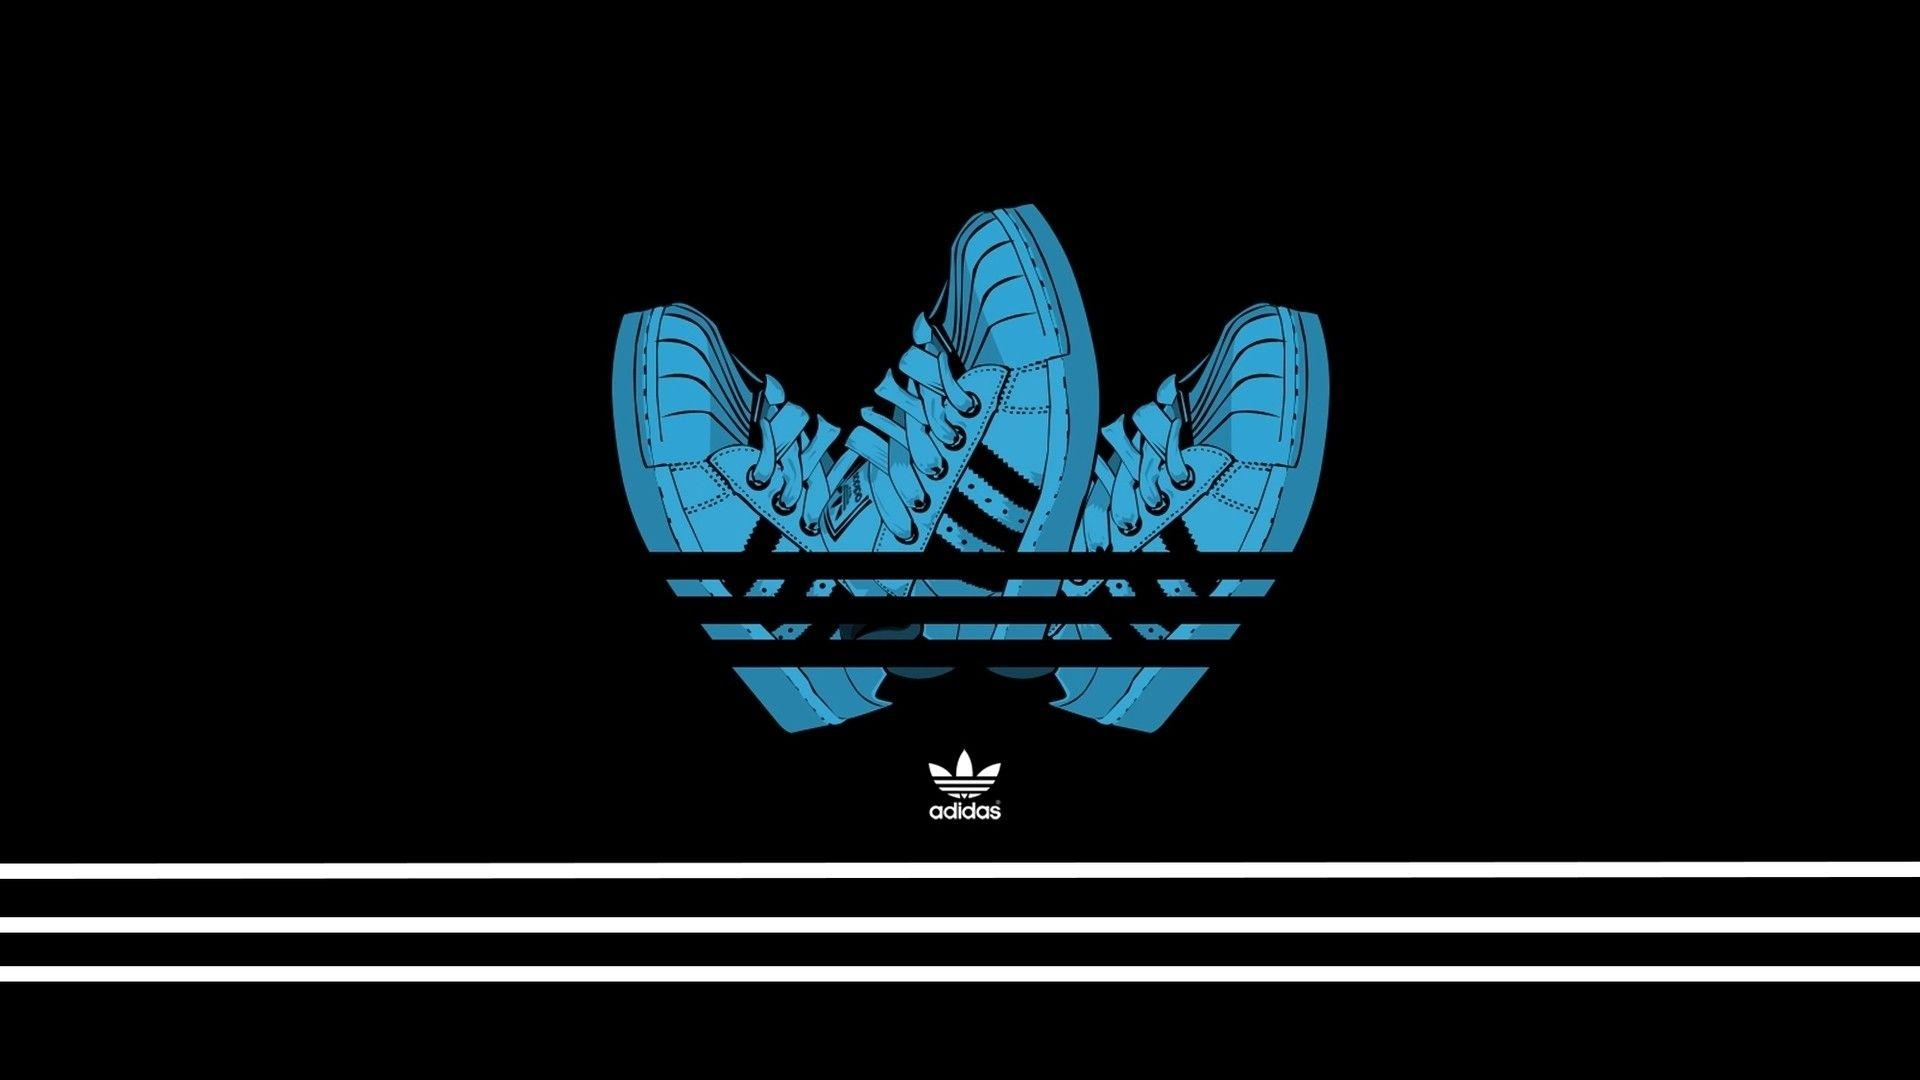 Download Logo Adidas Wallpaper